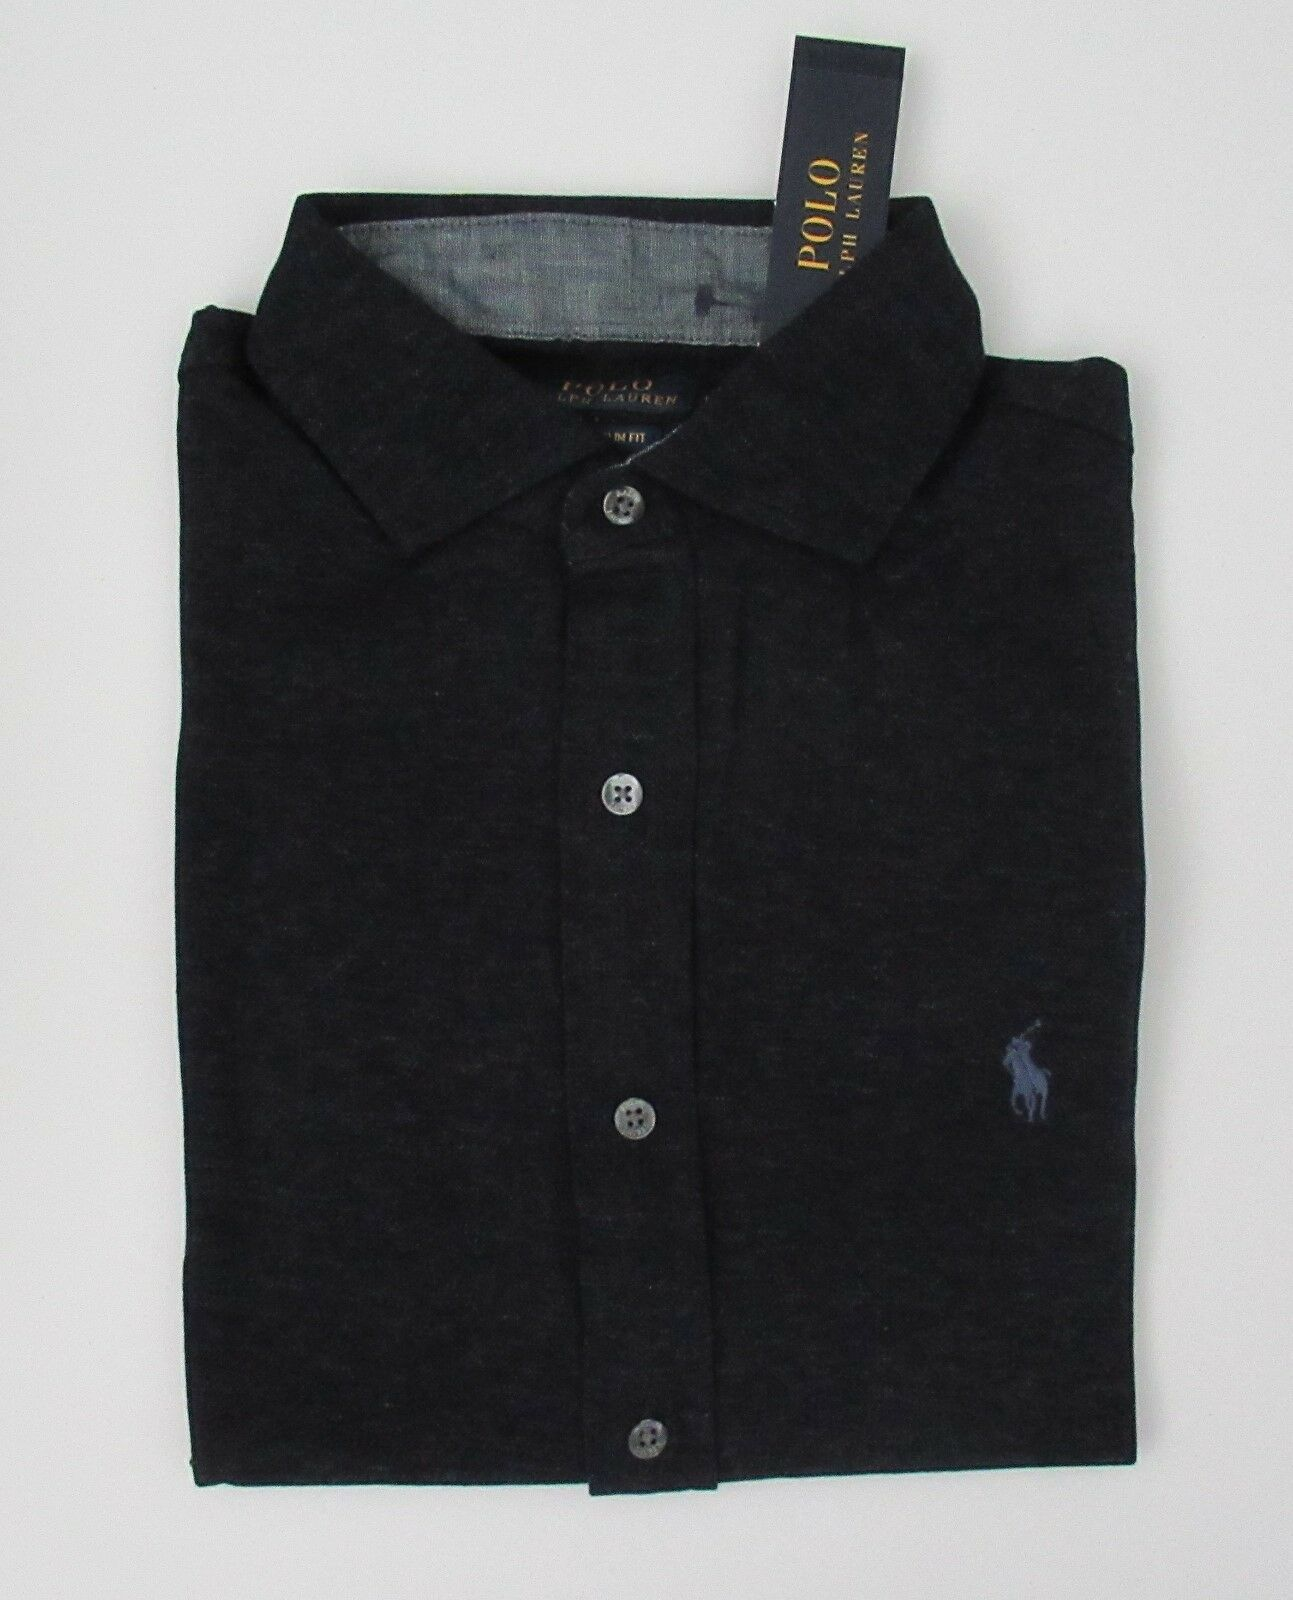 NWT Ralph Lauren SS Custom Slim Fit Button Front M Mesh Polo Shirt M Front L XL 2XL NEW 0bf895